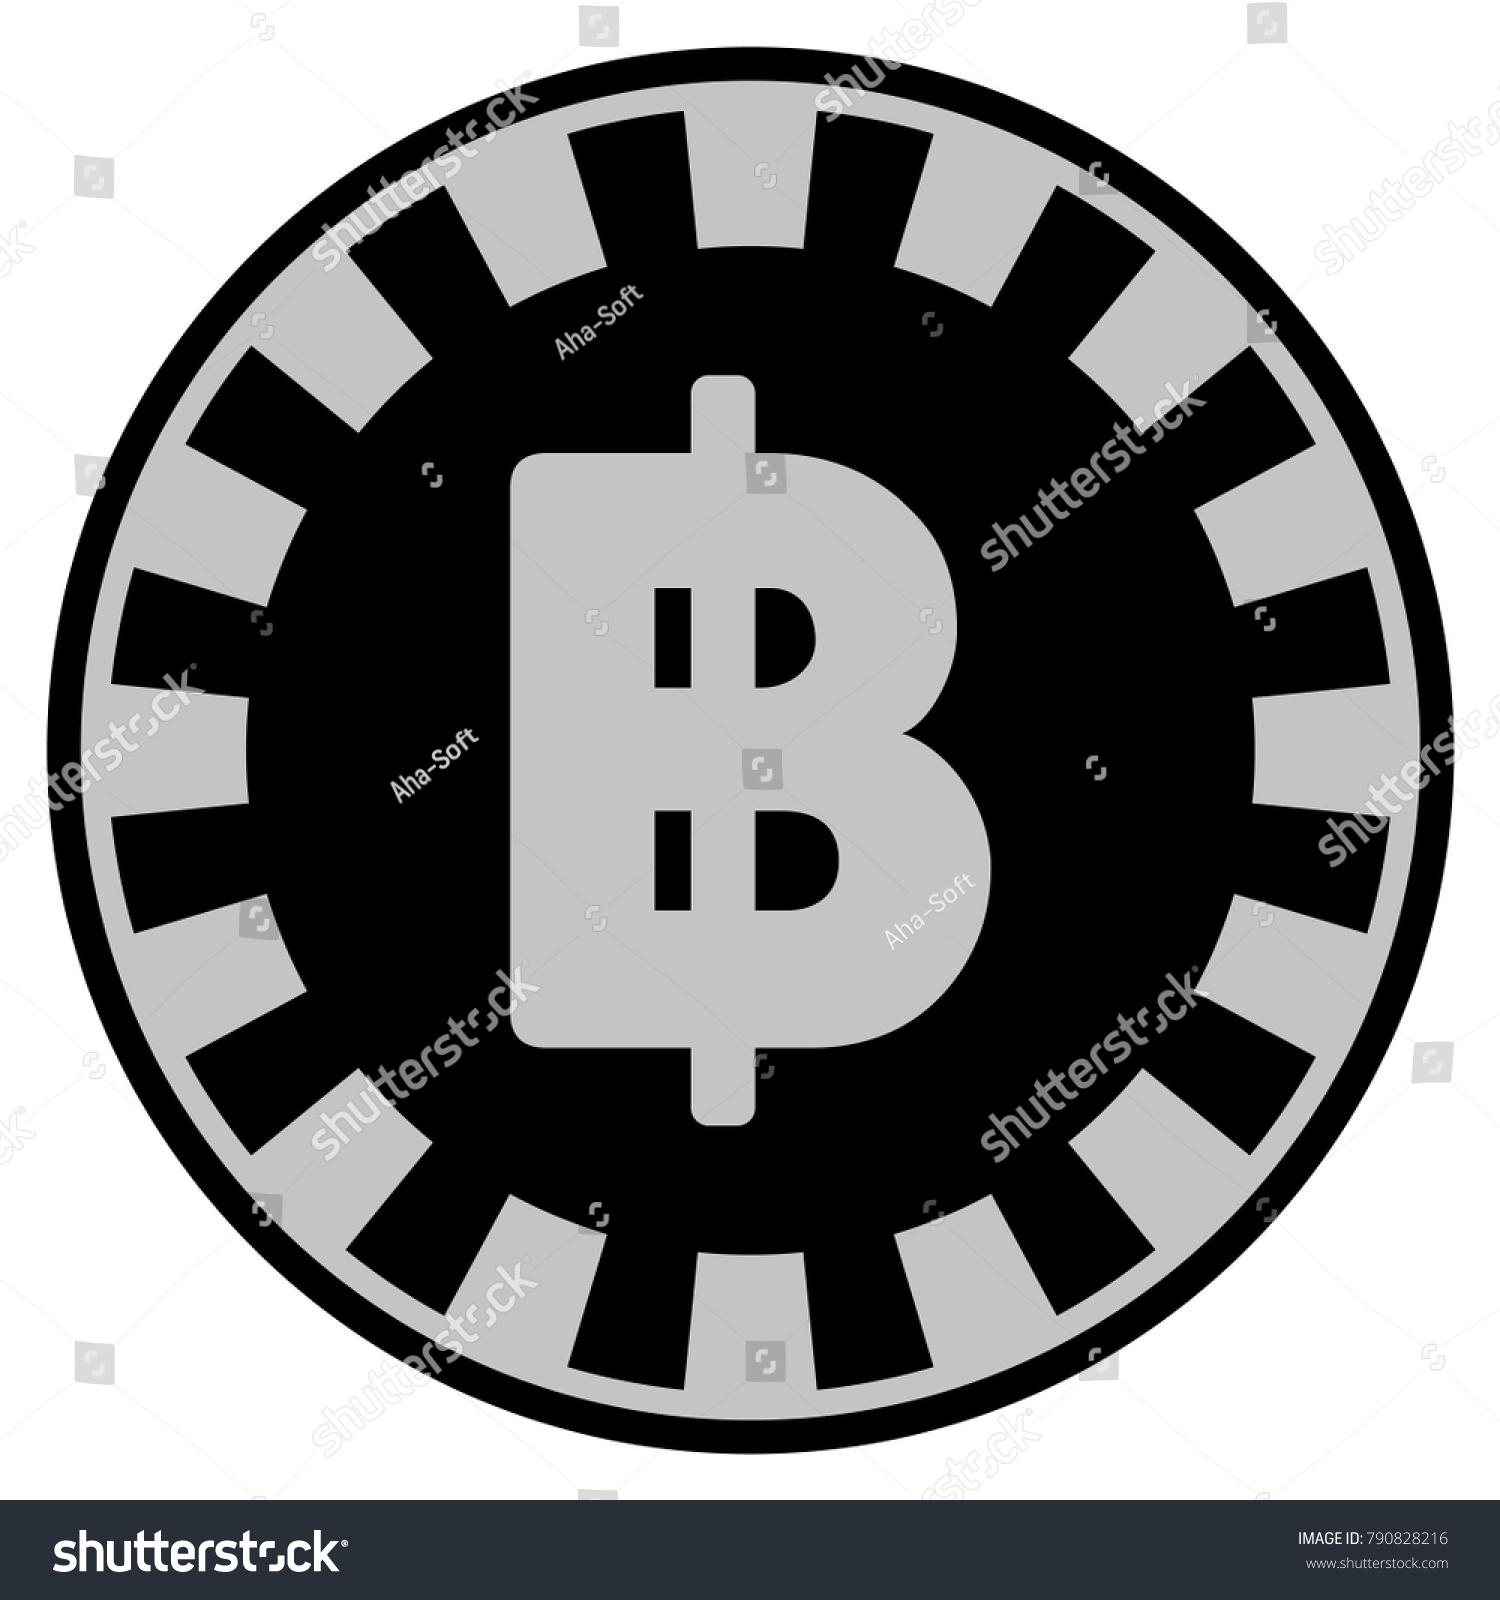 Thai Baht Black Casino Chip Icon Stock Illustration 790828216